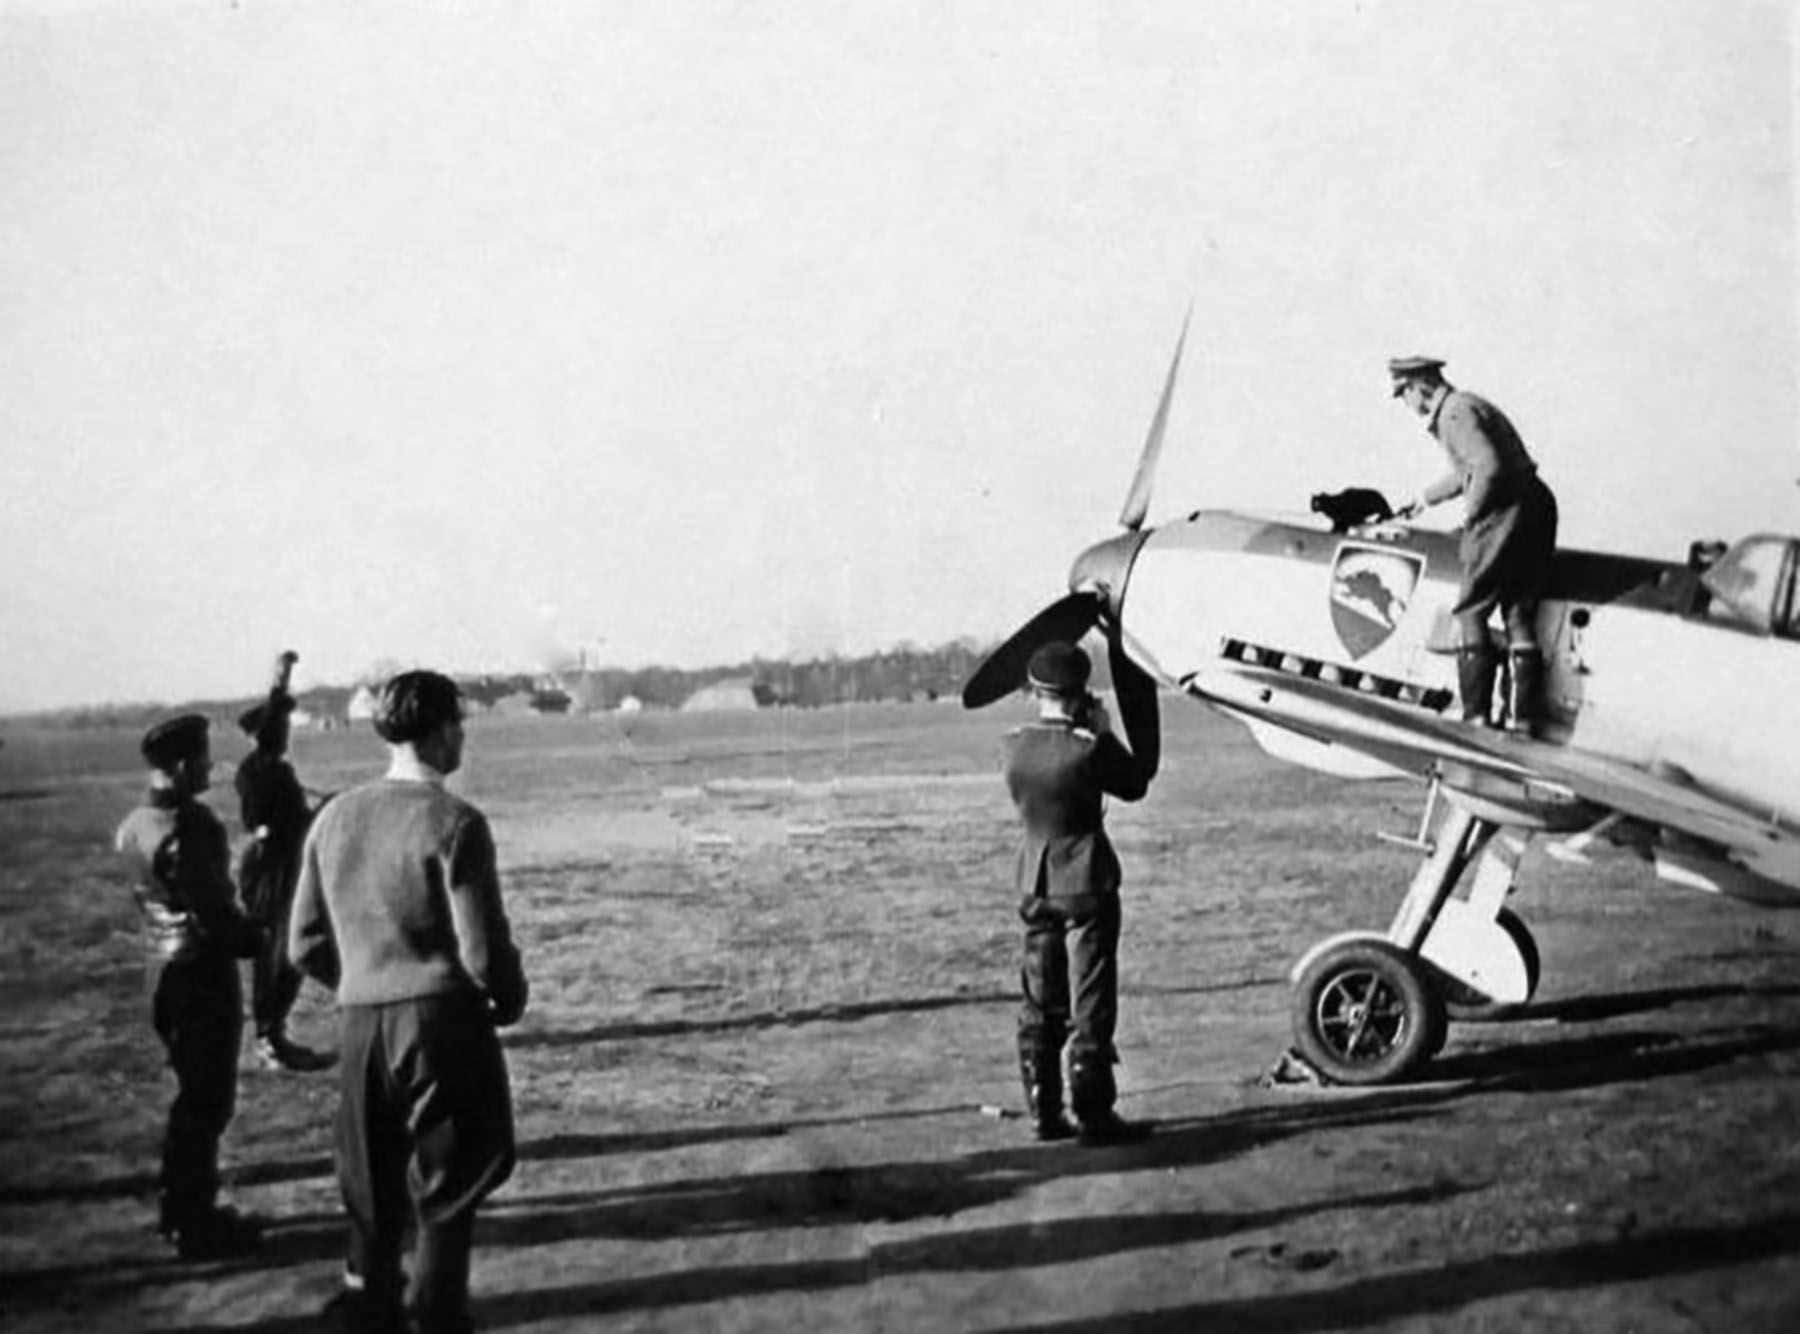 Messerschmitt Bf 109E3 2.JG52 most likely Frankfurt Germany 1940 01